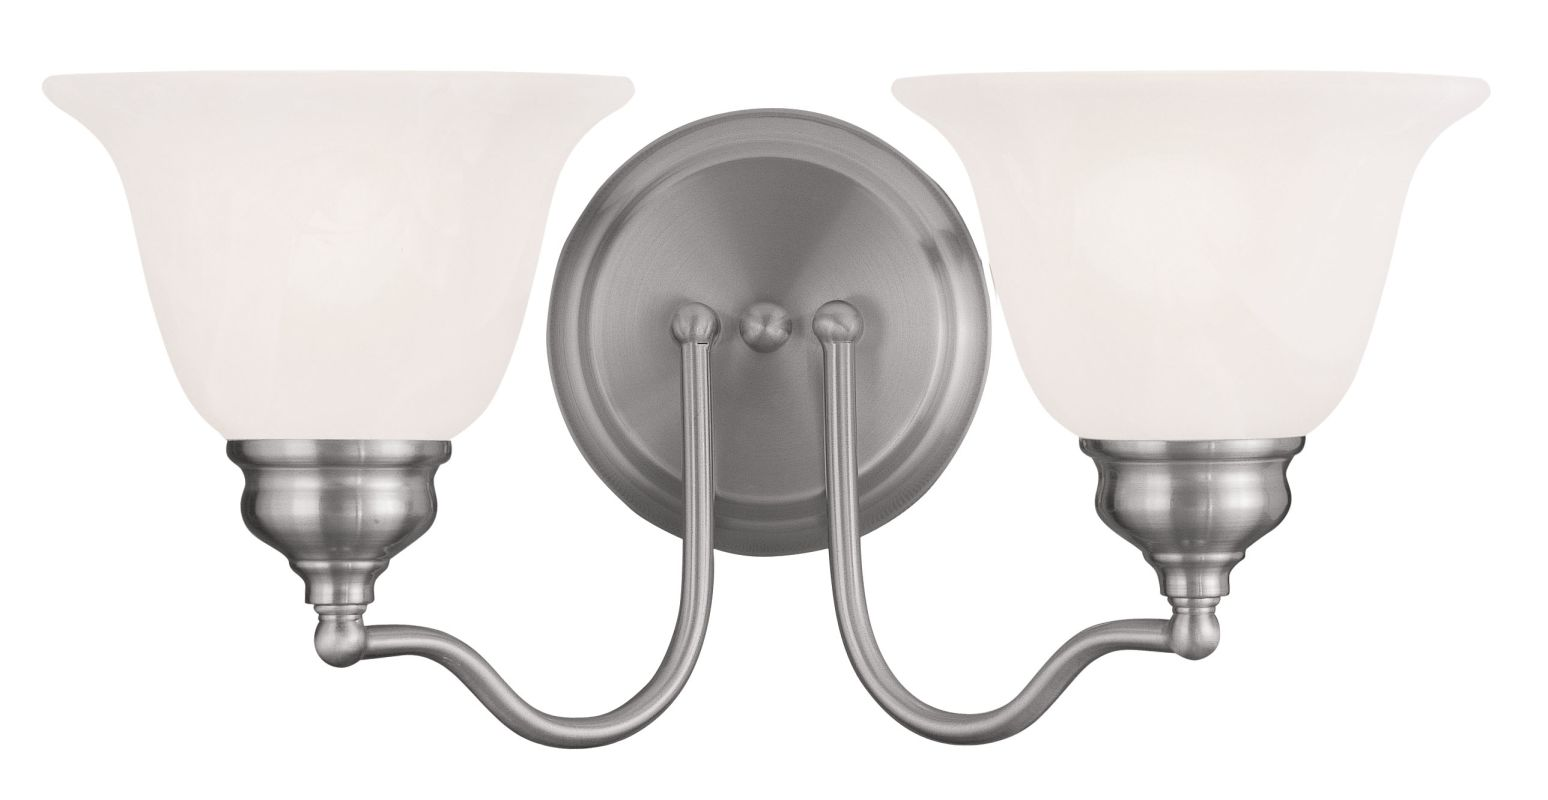 Livex Lighting 1352 Essex Bathroom Vanity Bar with 2 Lights Brushed